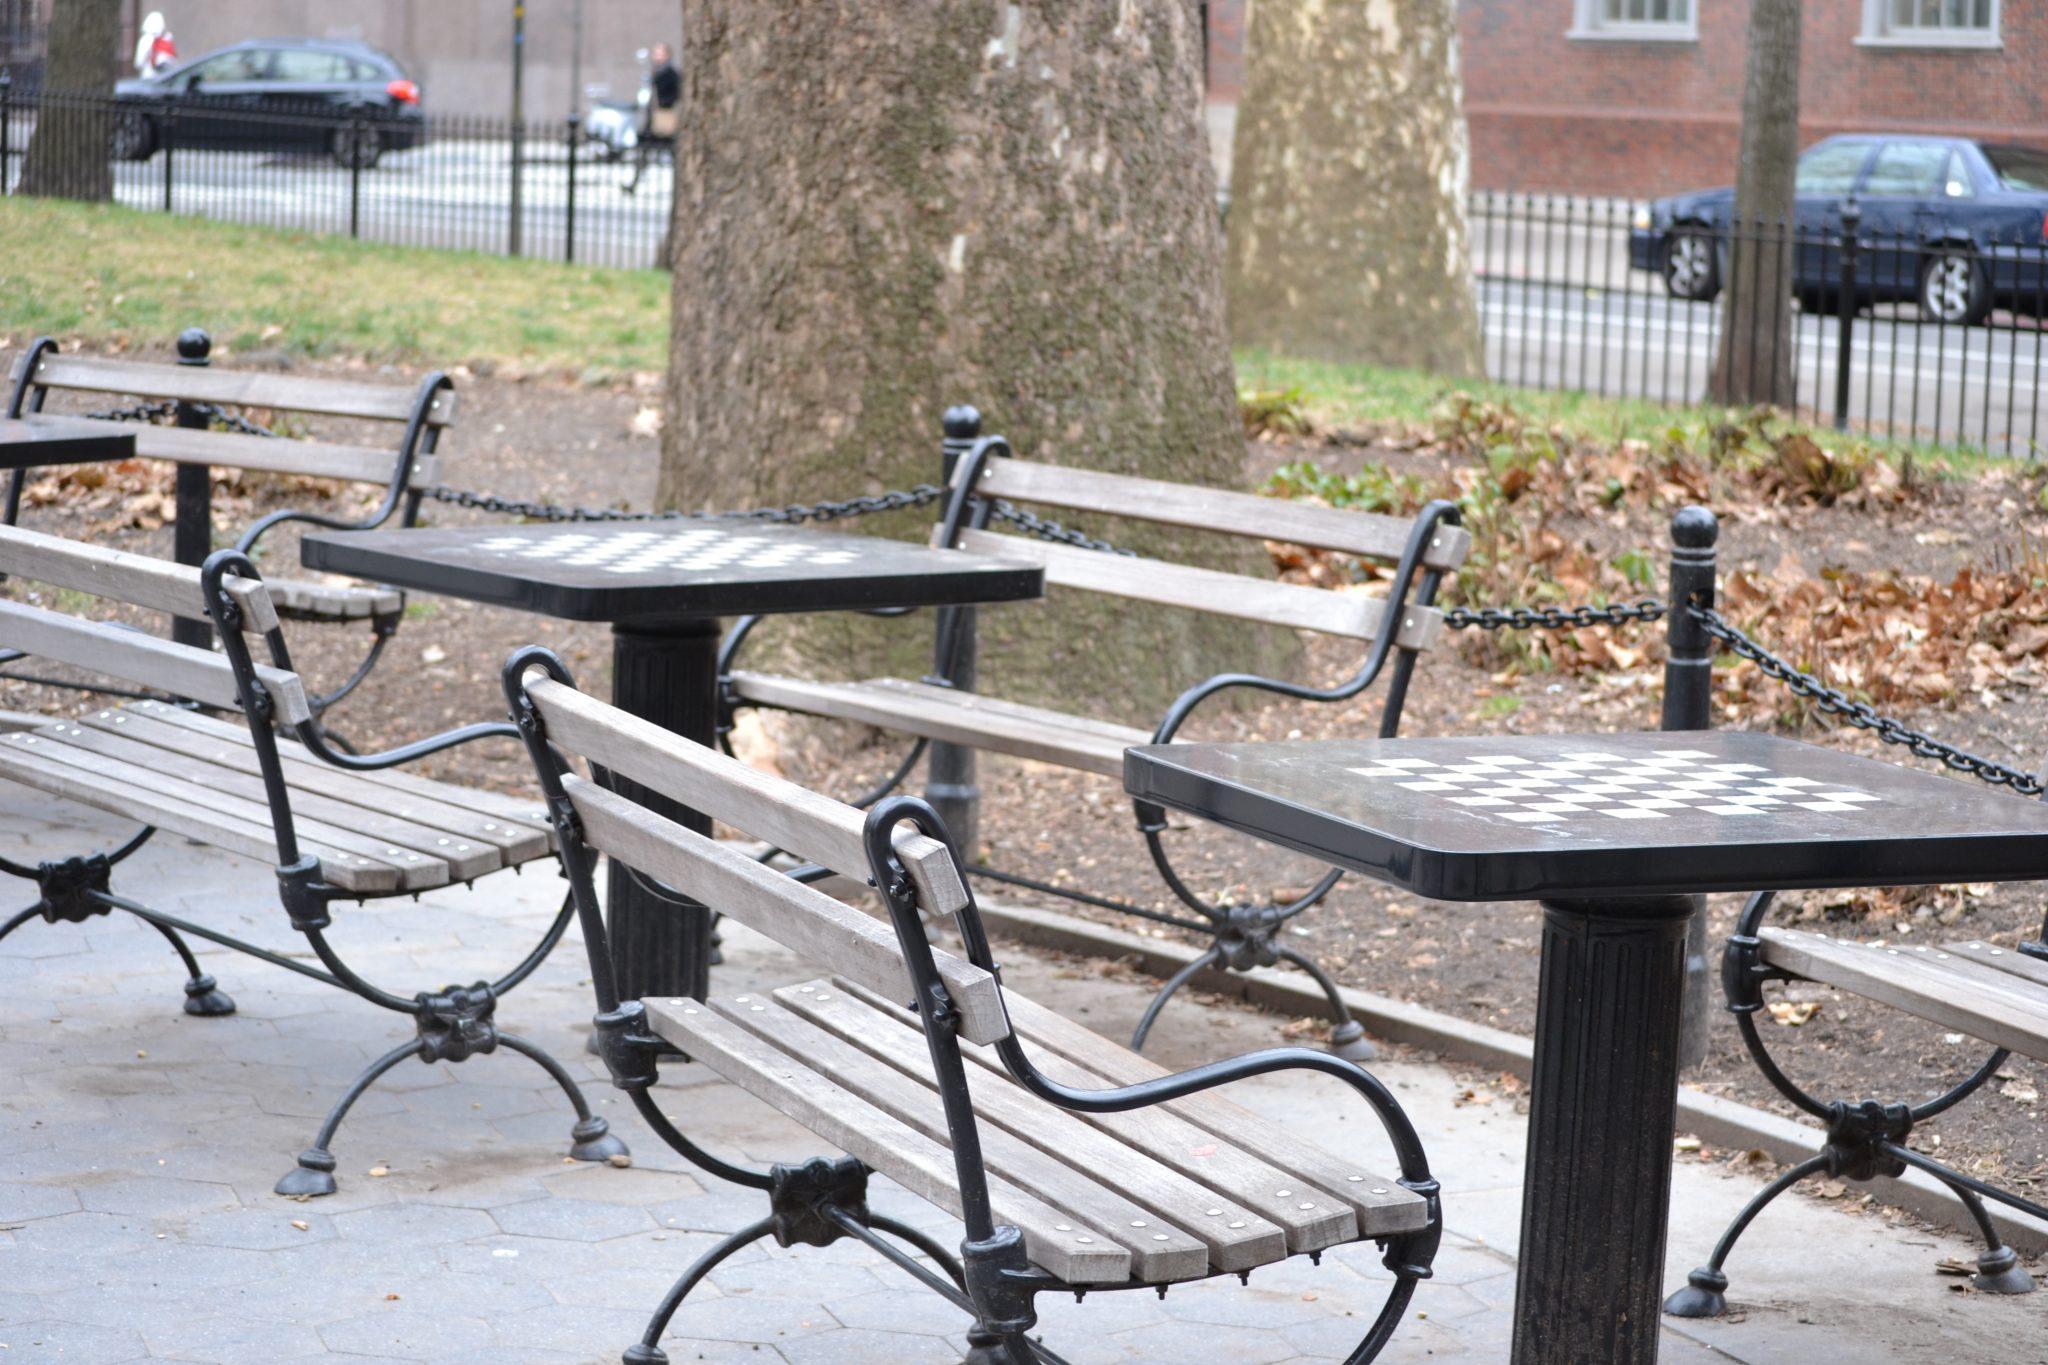 Eine Woche in New York: Washington Square Park & Madison Square Park - dsc 0342